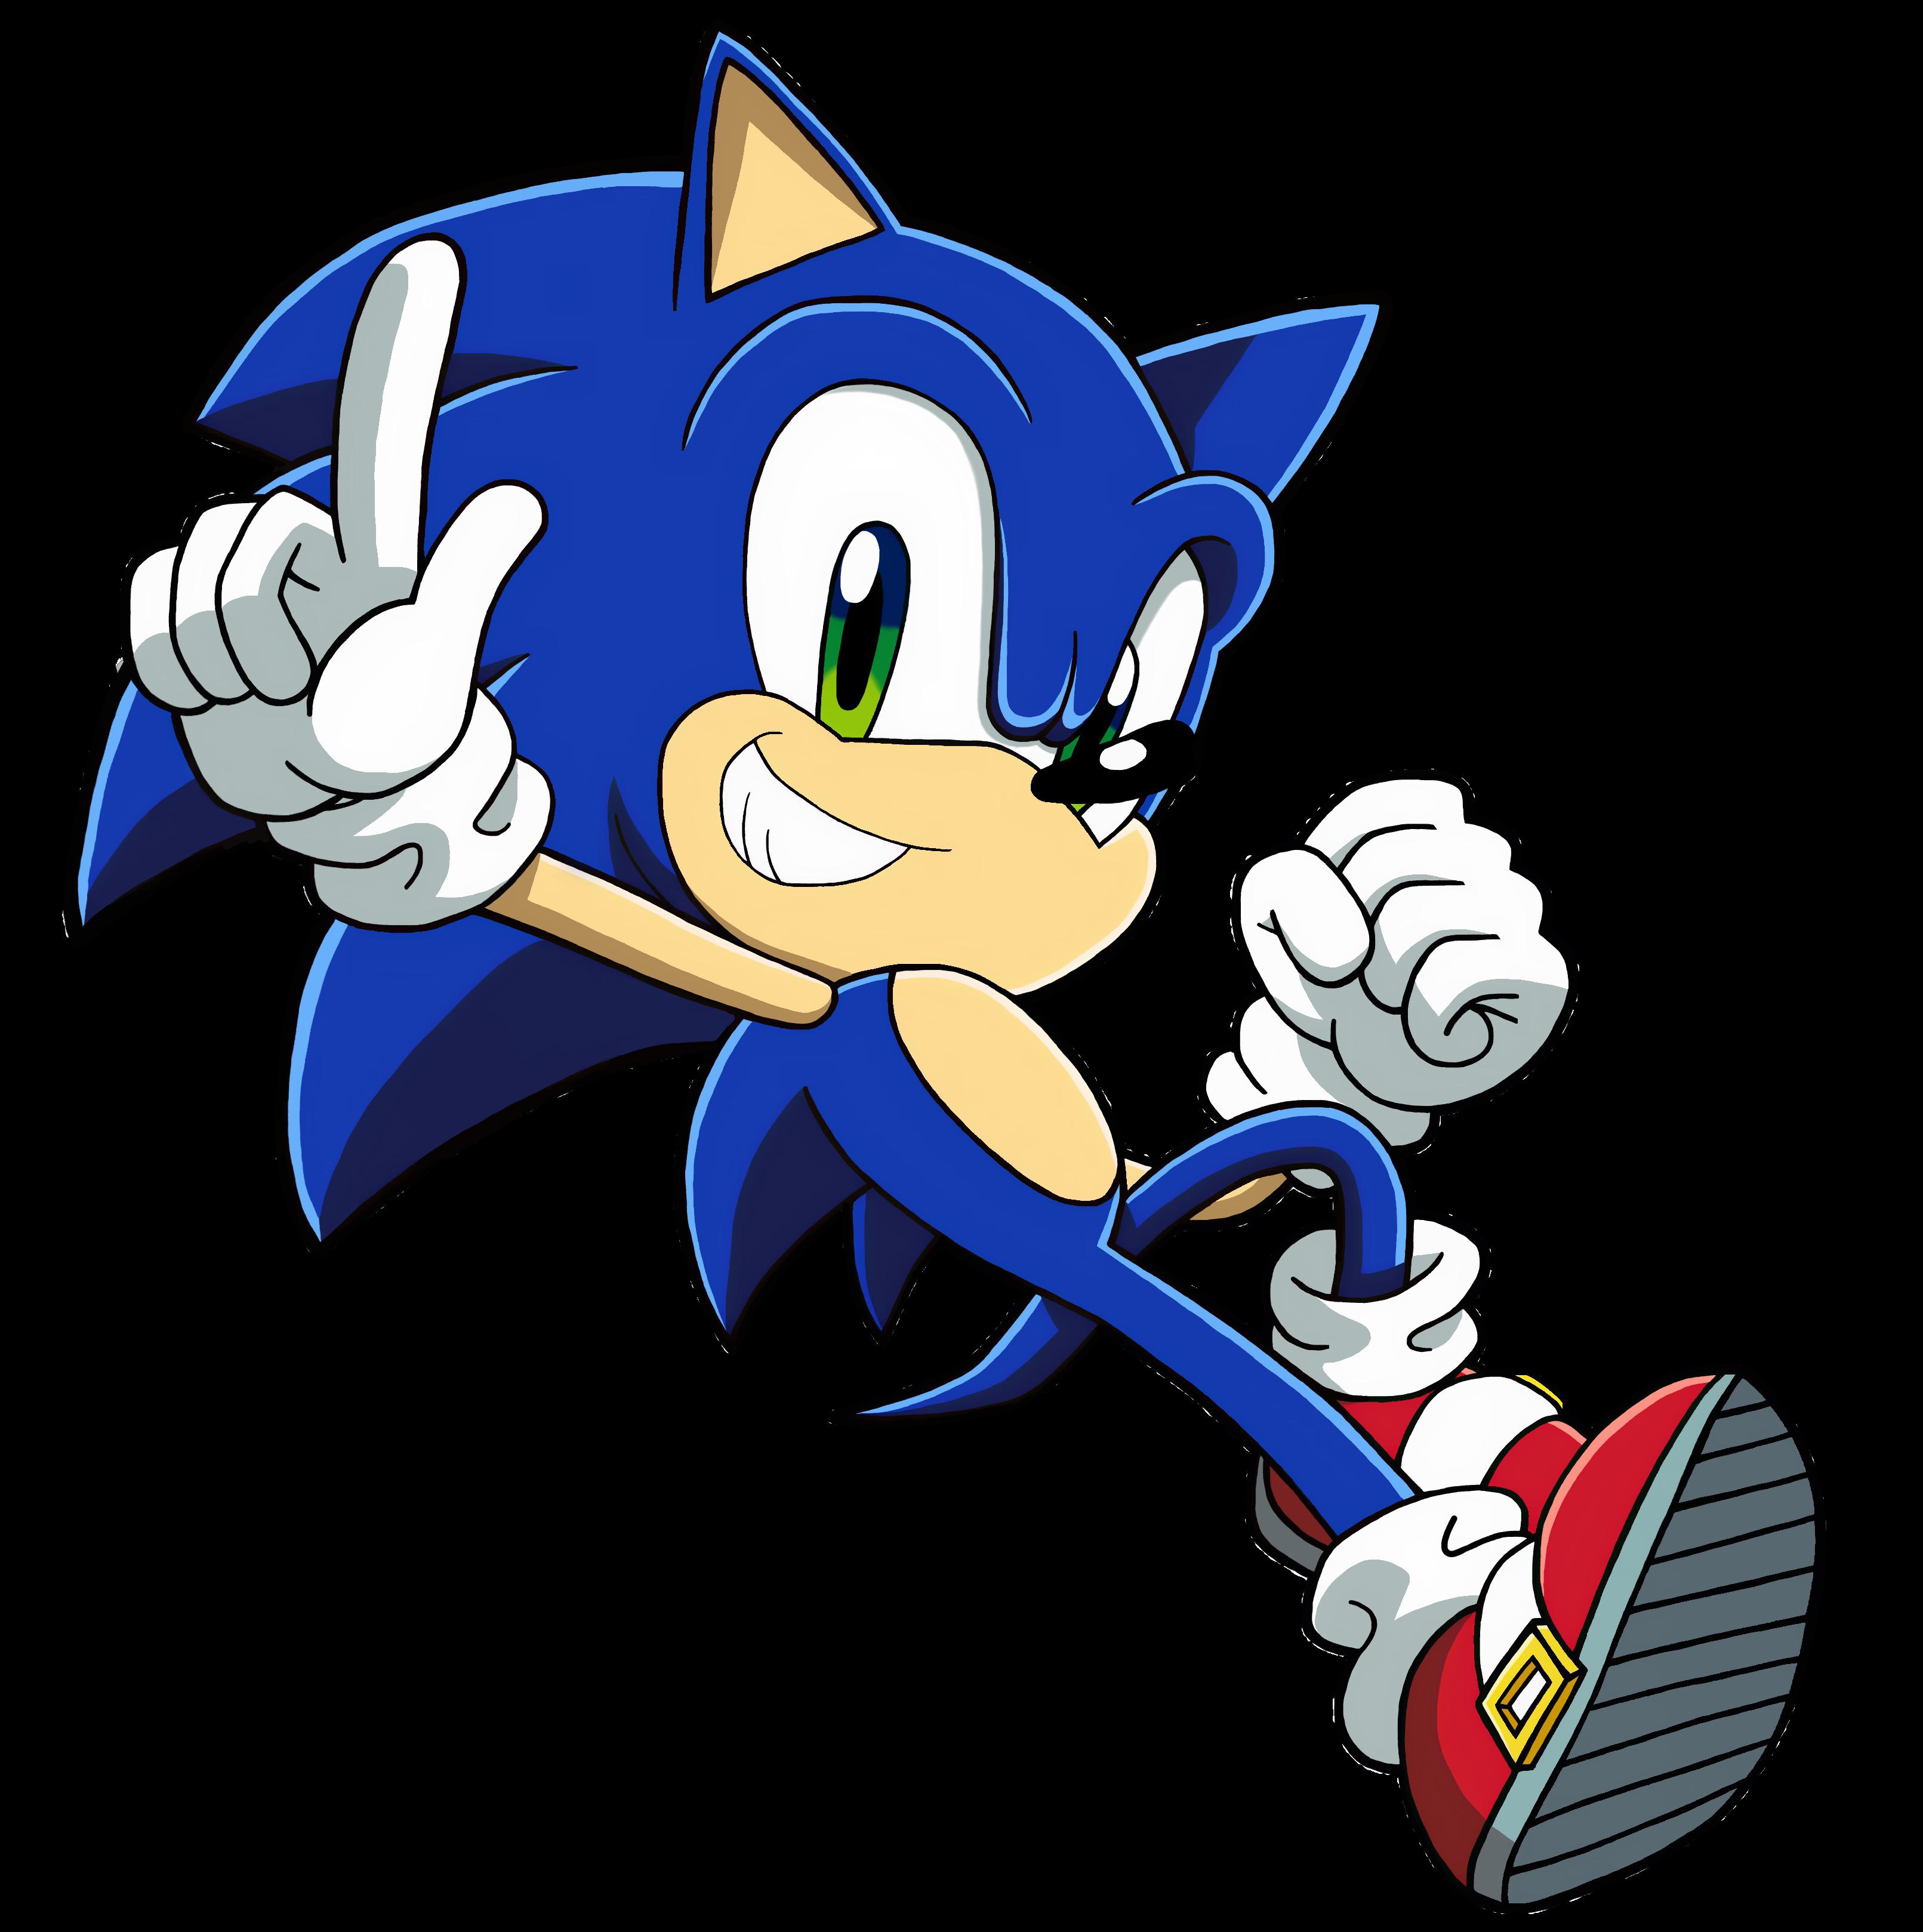 Modern Sonic The Hedgehog By Bluetyphoon17 On Deviantart